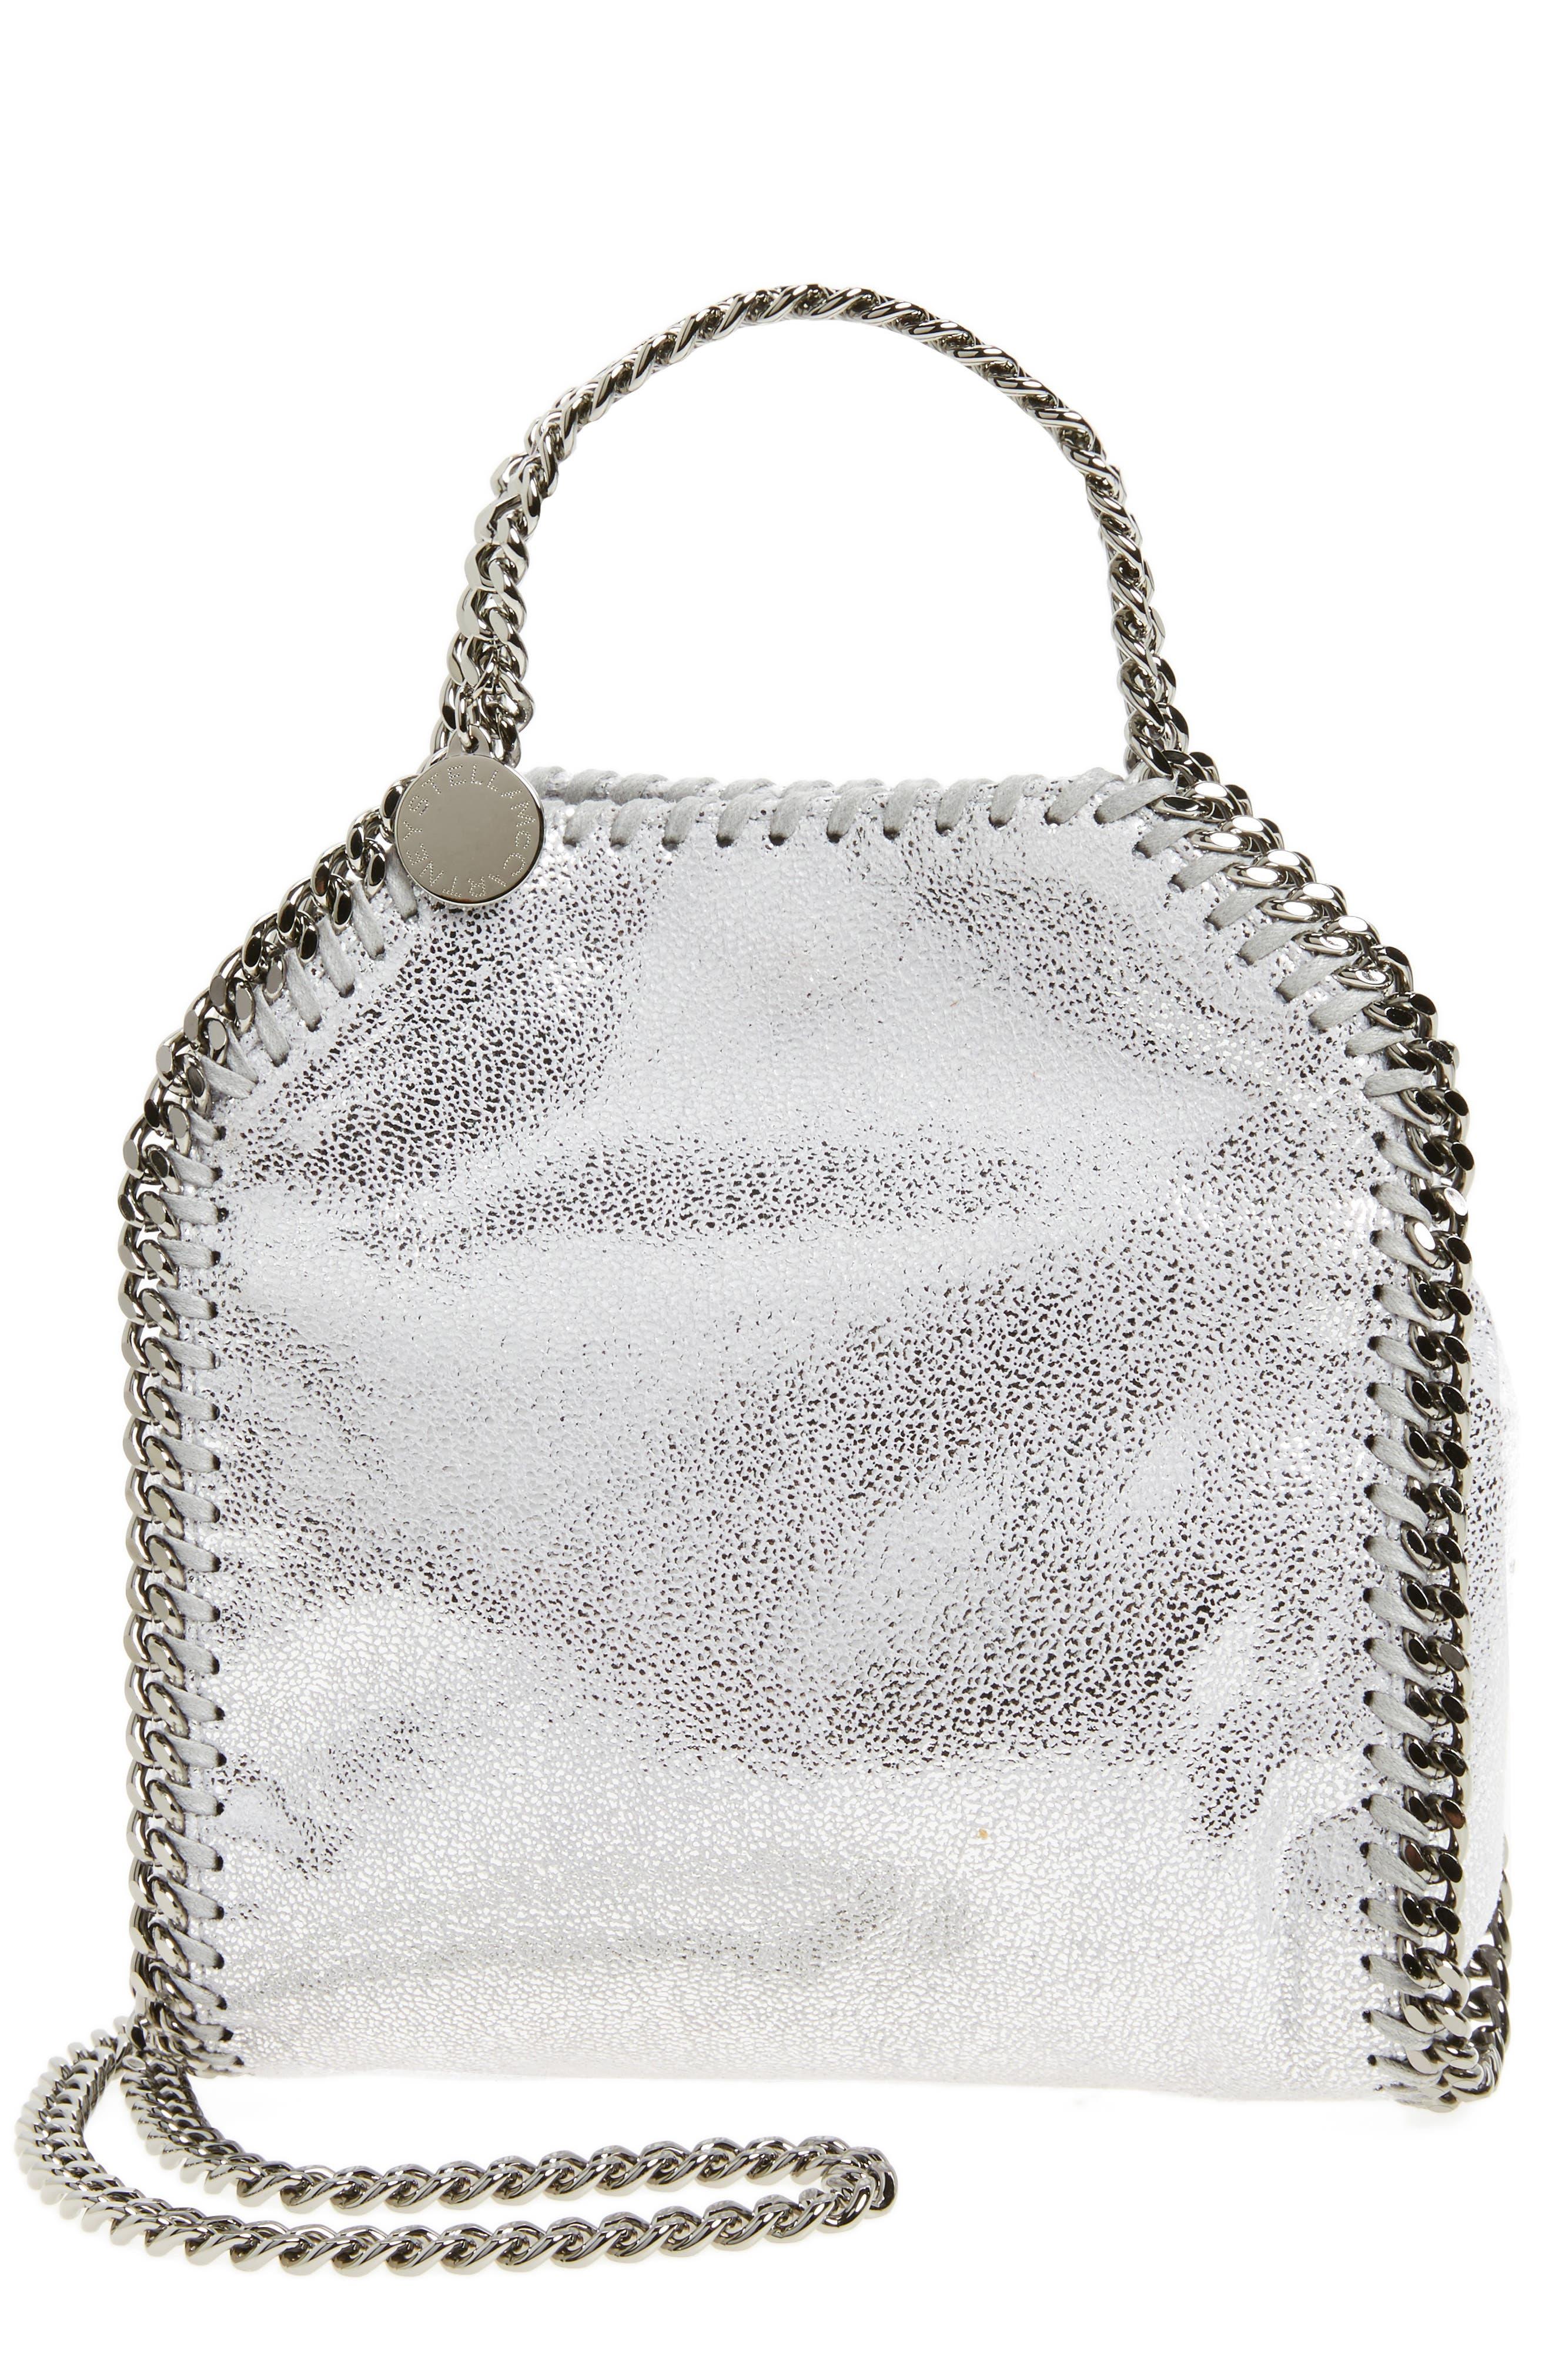 'Tiny Falabella' Metallic Faux Leather Crossbody Bag,                             Main thumbnail 1, color,                             045